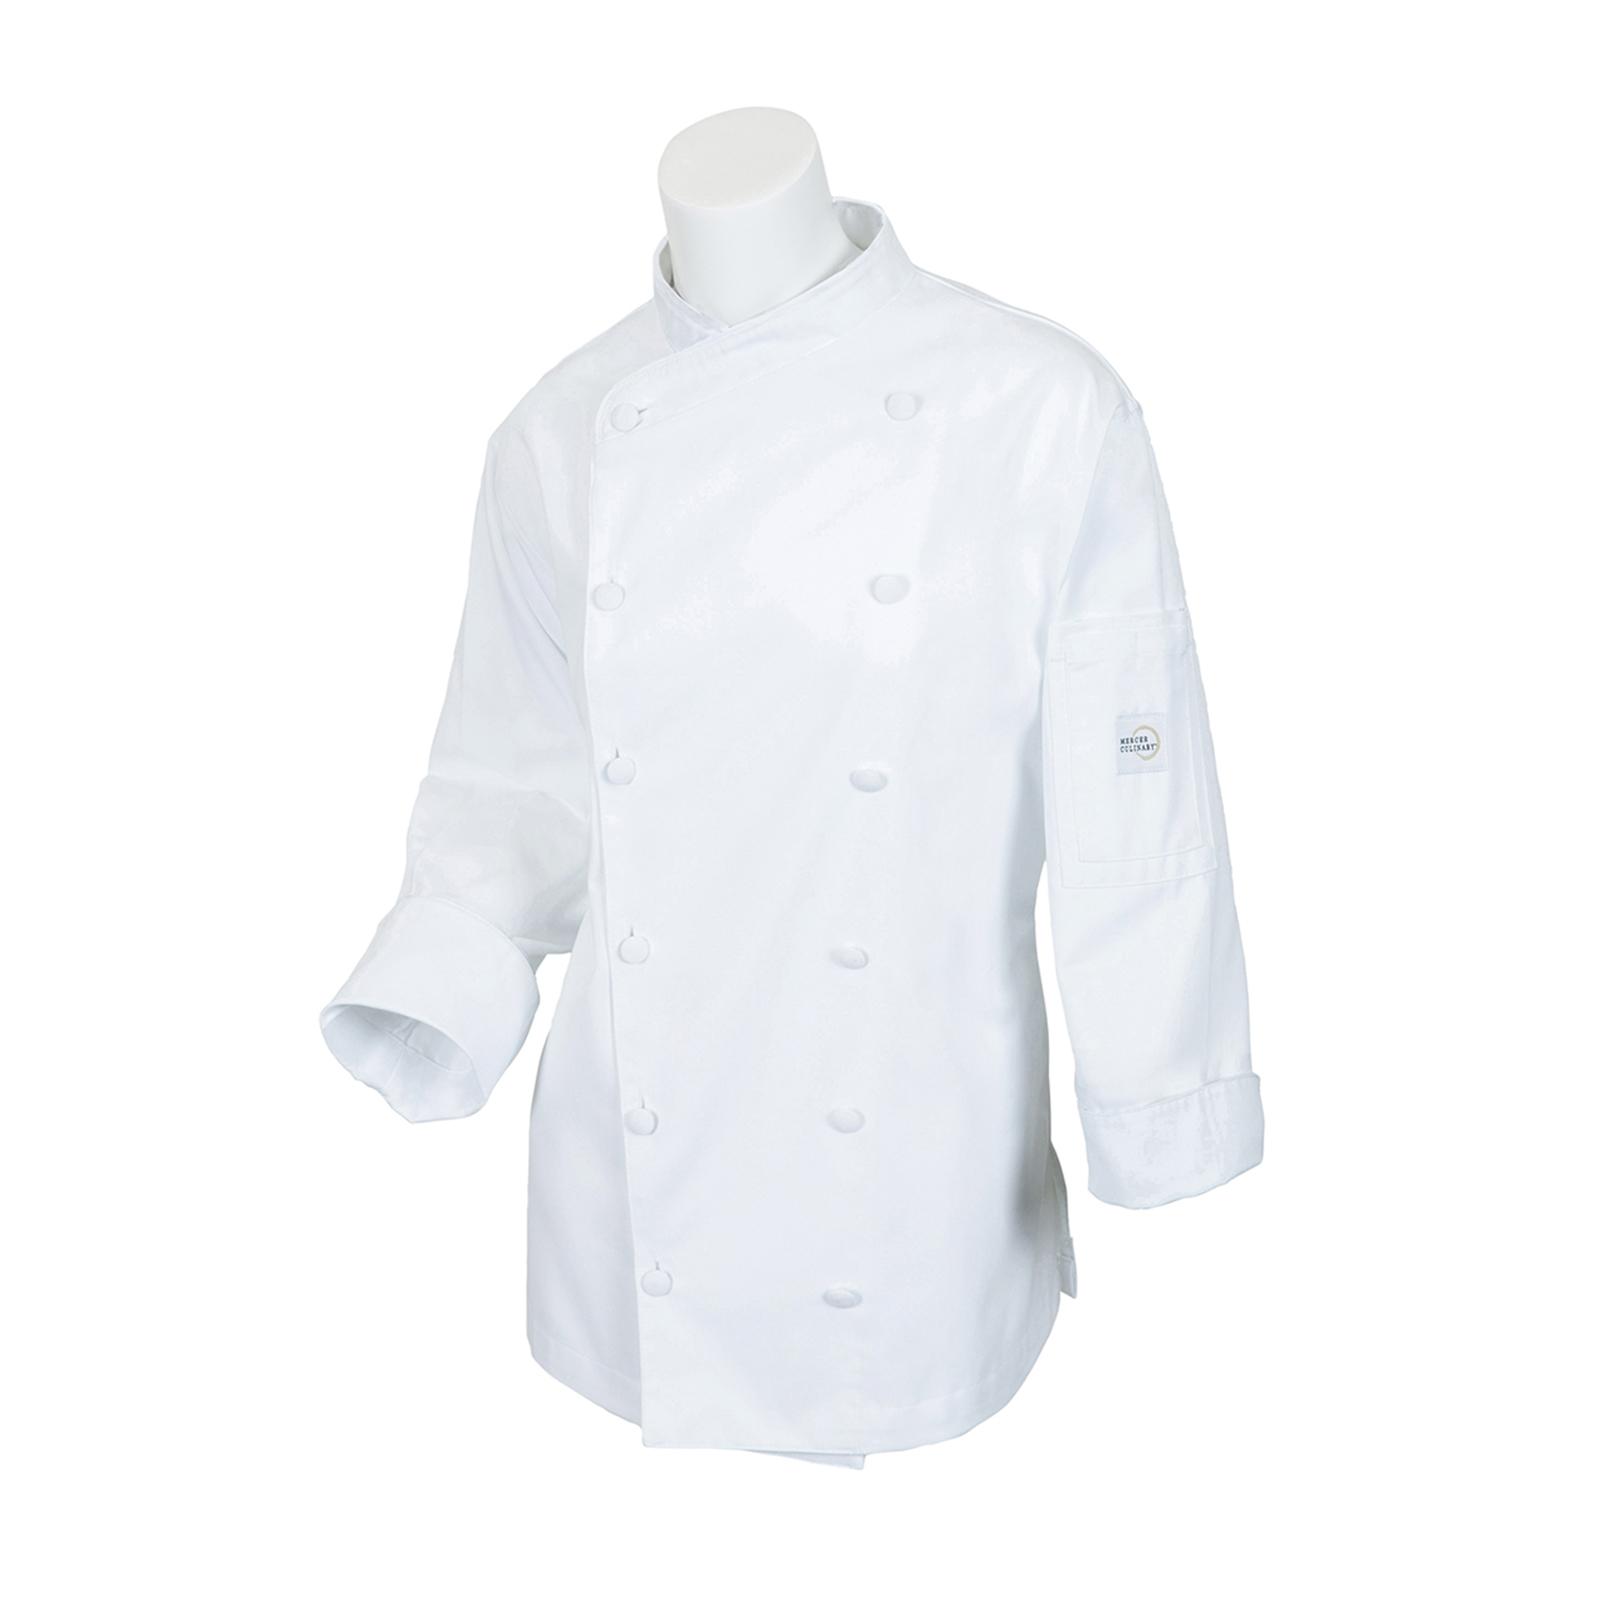 Mercer Culinary M62040WHL chef's coat